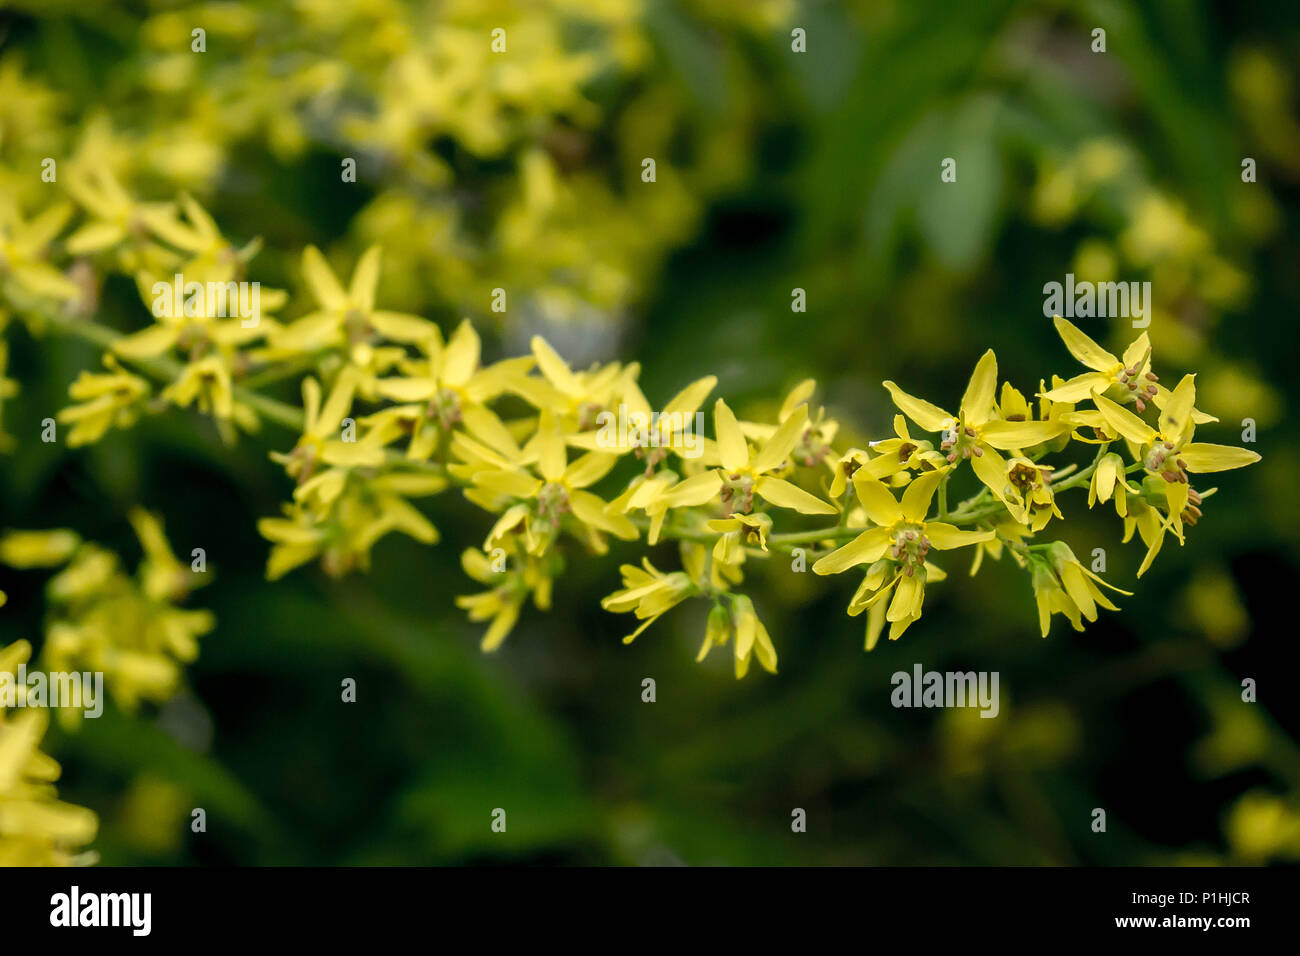 Yellow flowers of Kolreuteria paniculata - Stock Image